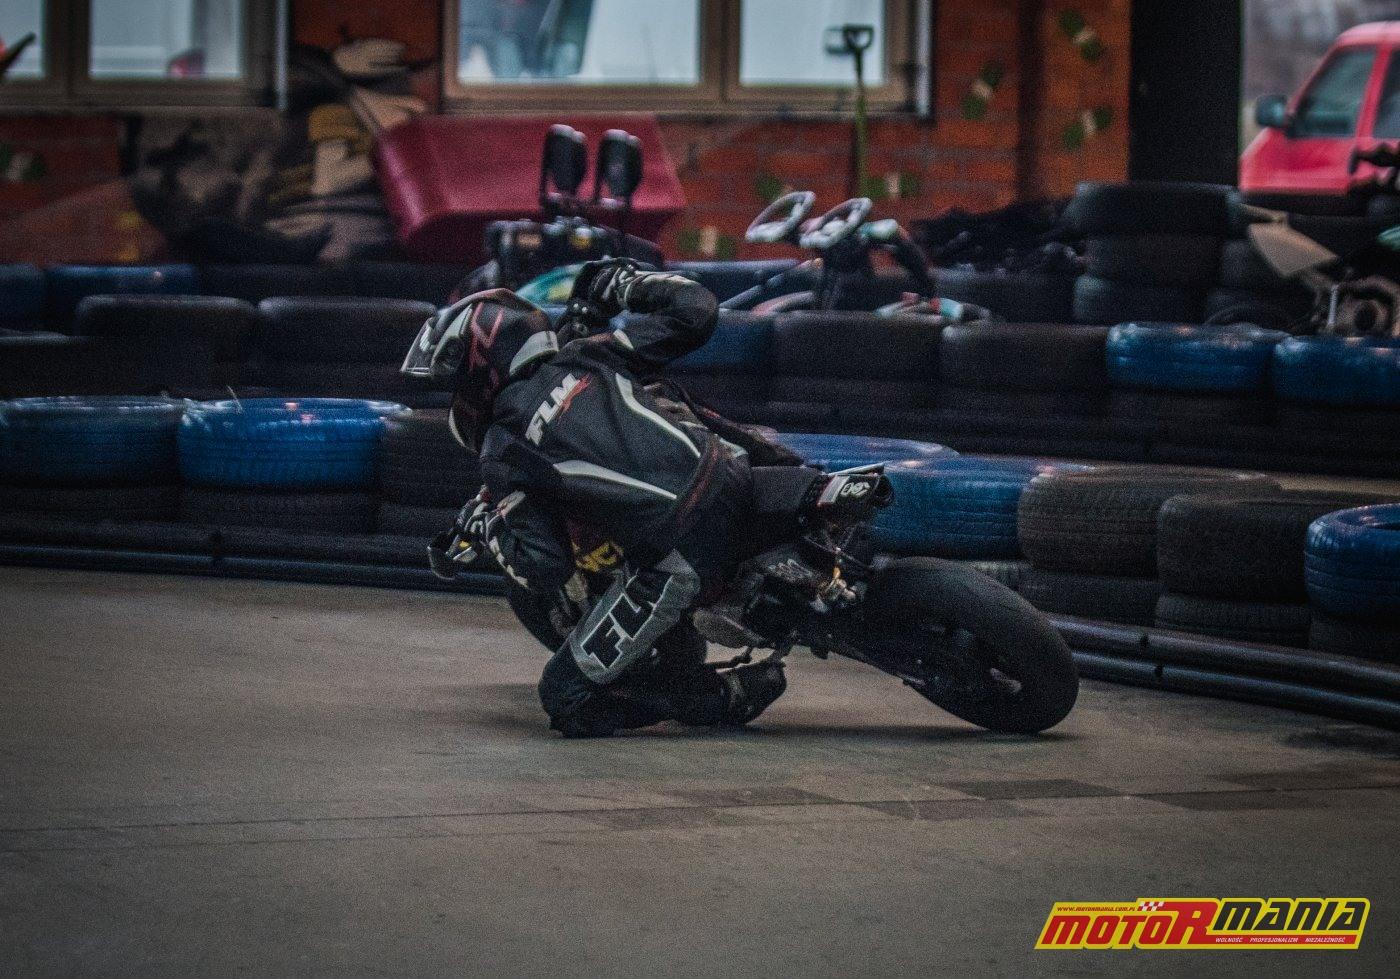 MotoRmania KidzGP Team - treningi przed sezonem 2019 (2)